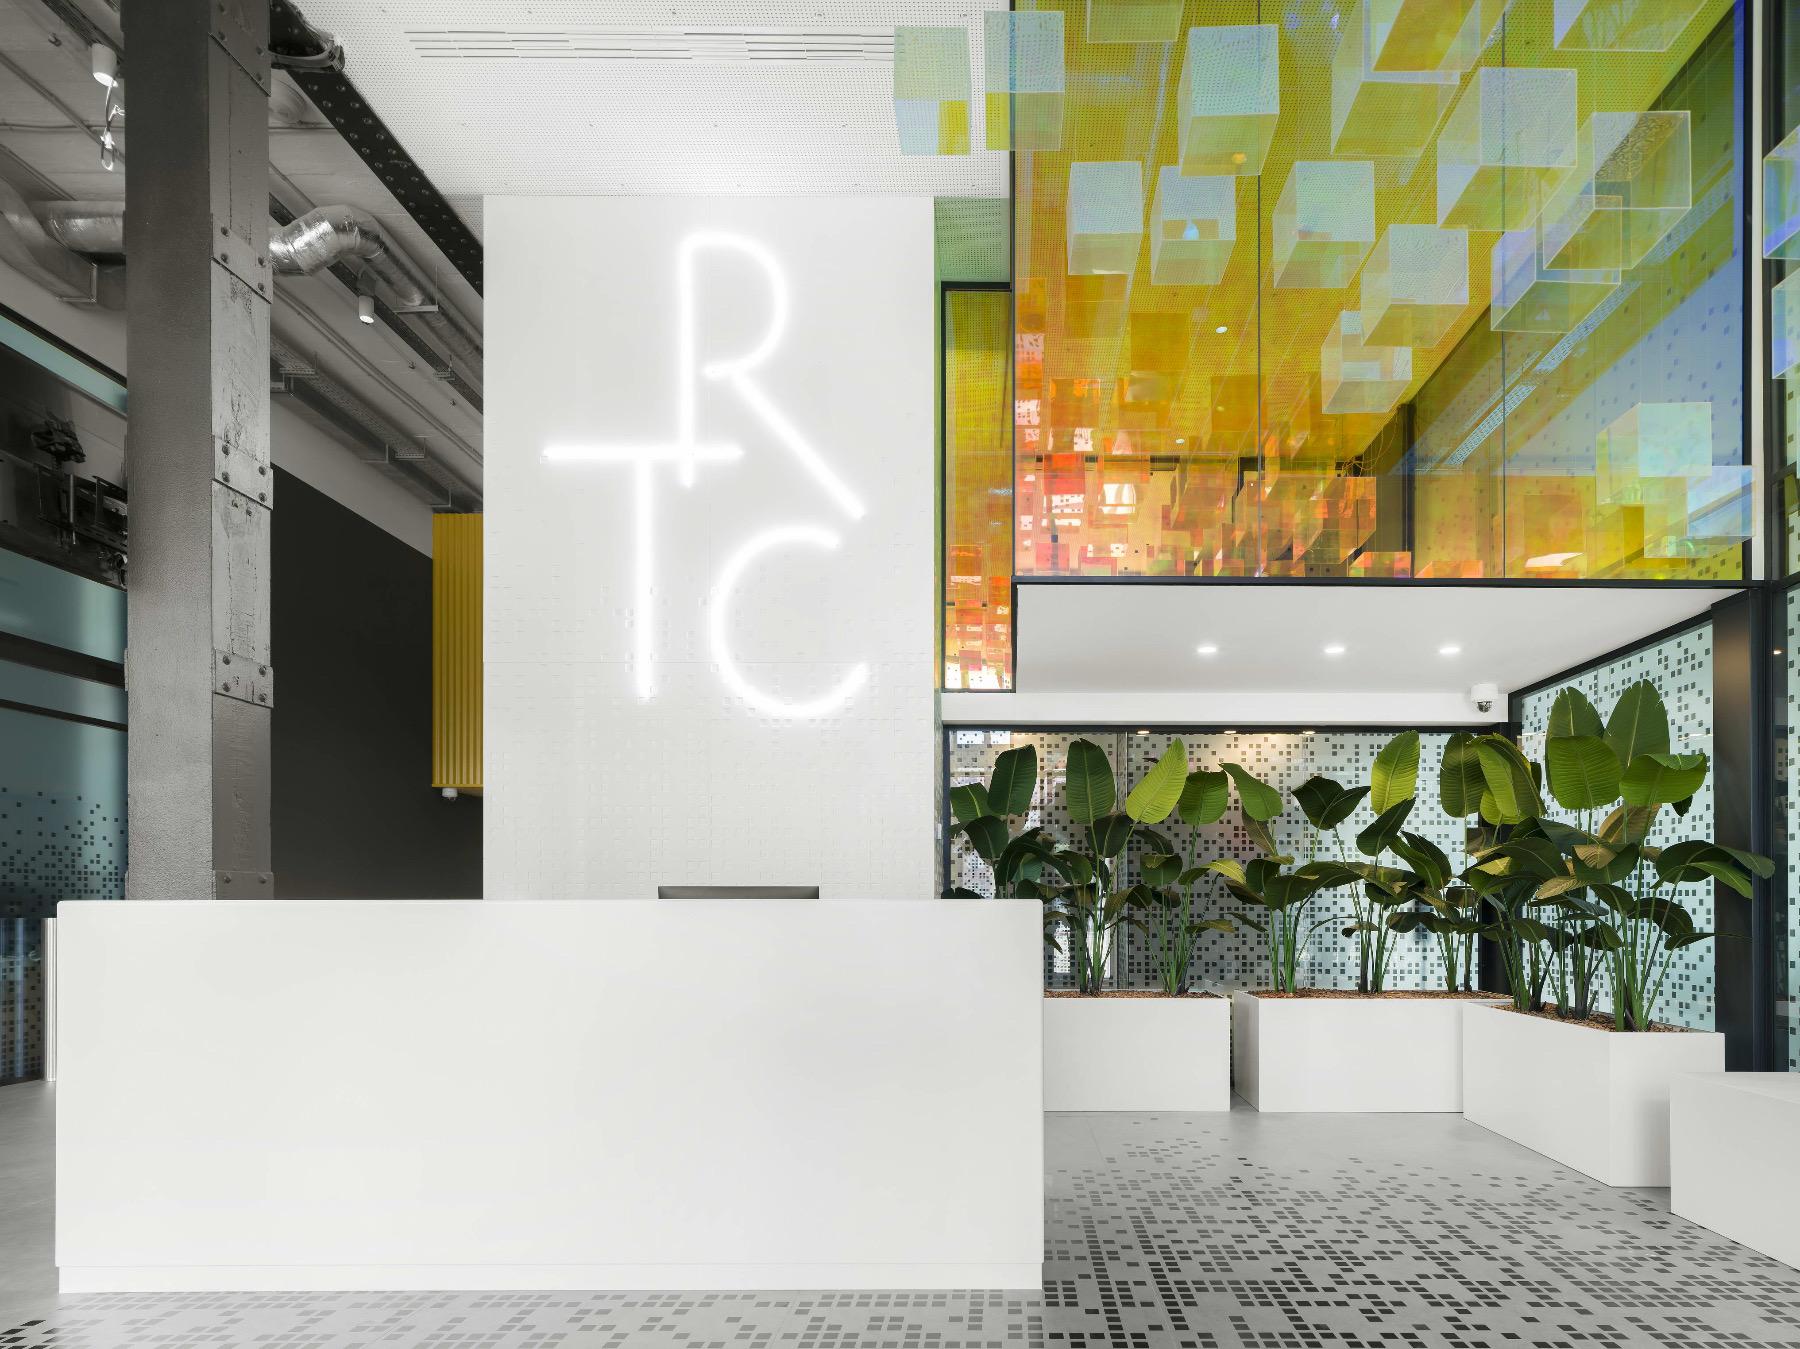 raifeissen-omsk-office-20